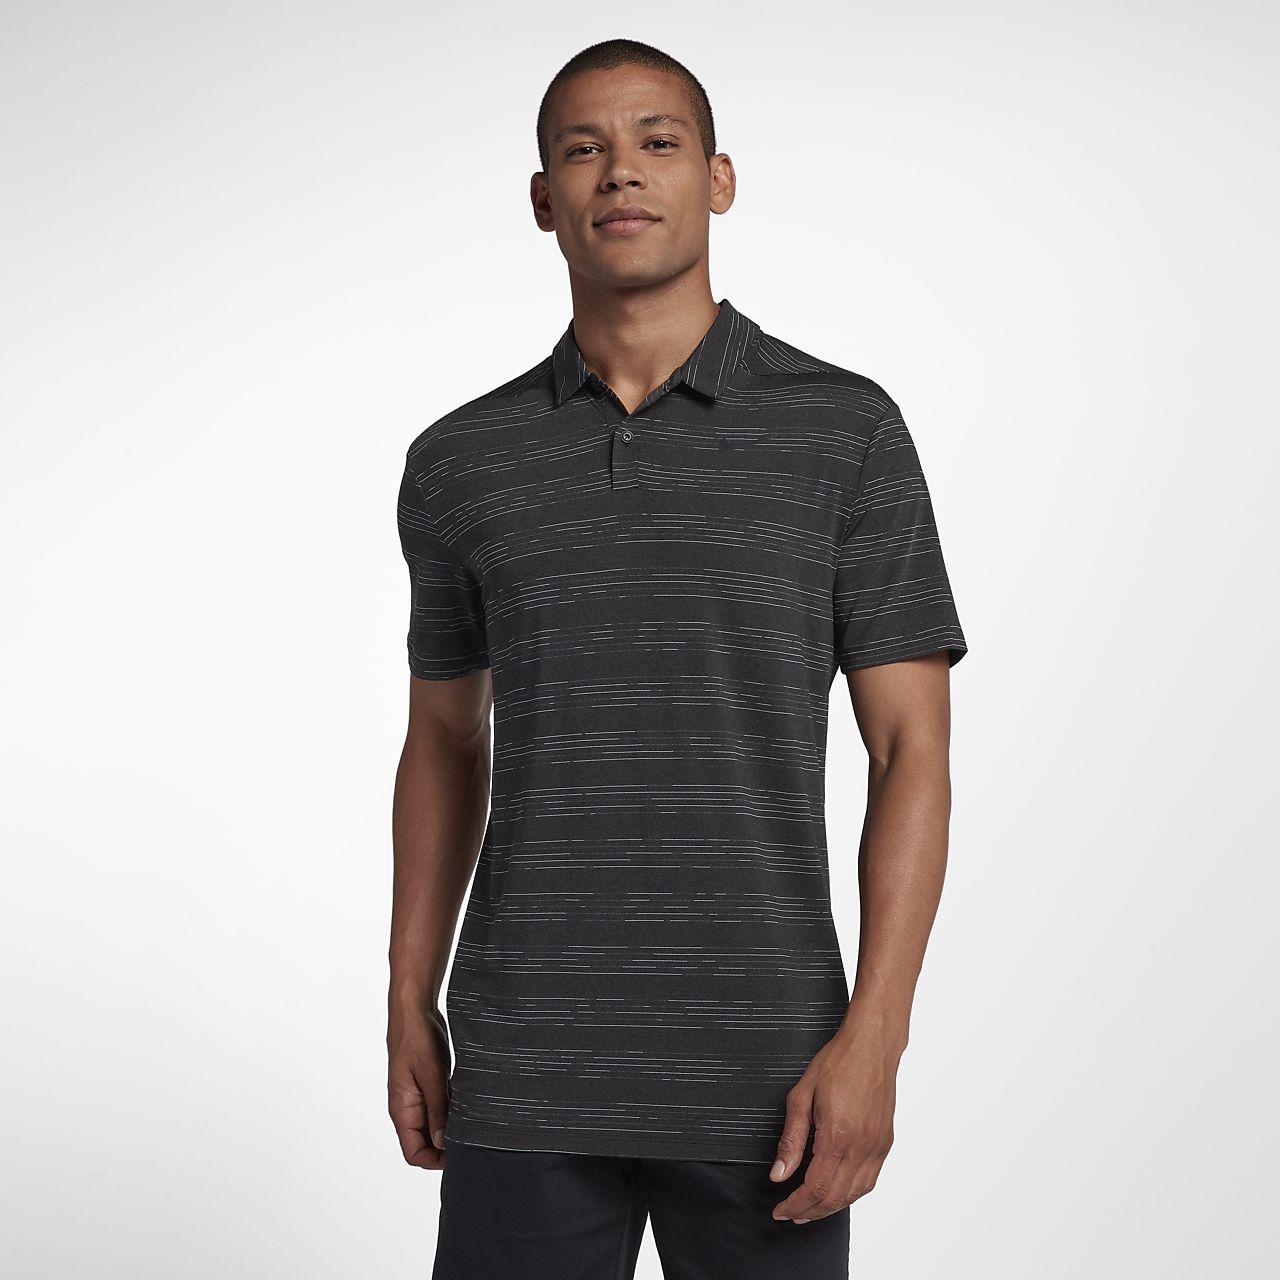 Nike Dri Fit Mens Golf Polo Nike